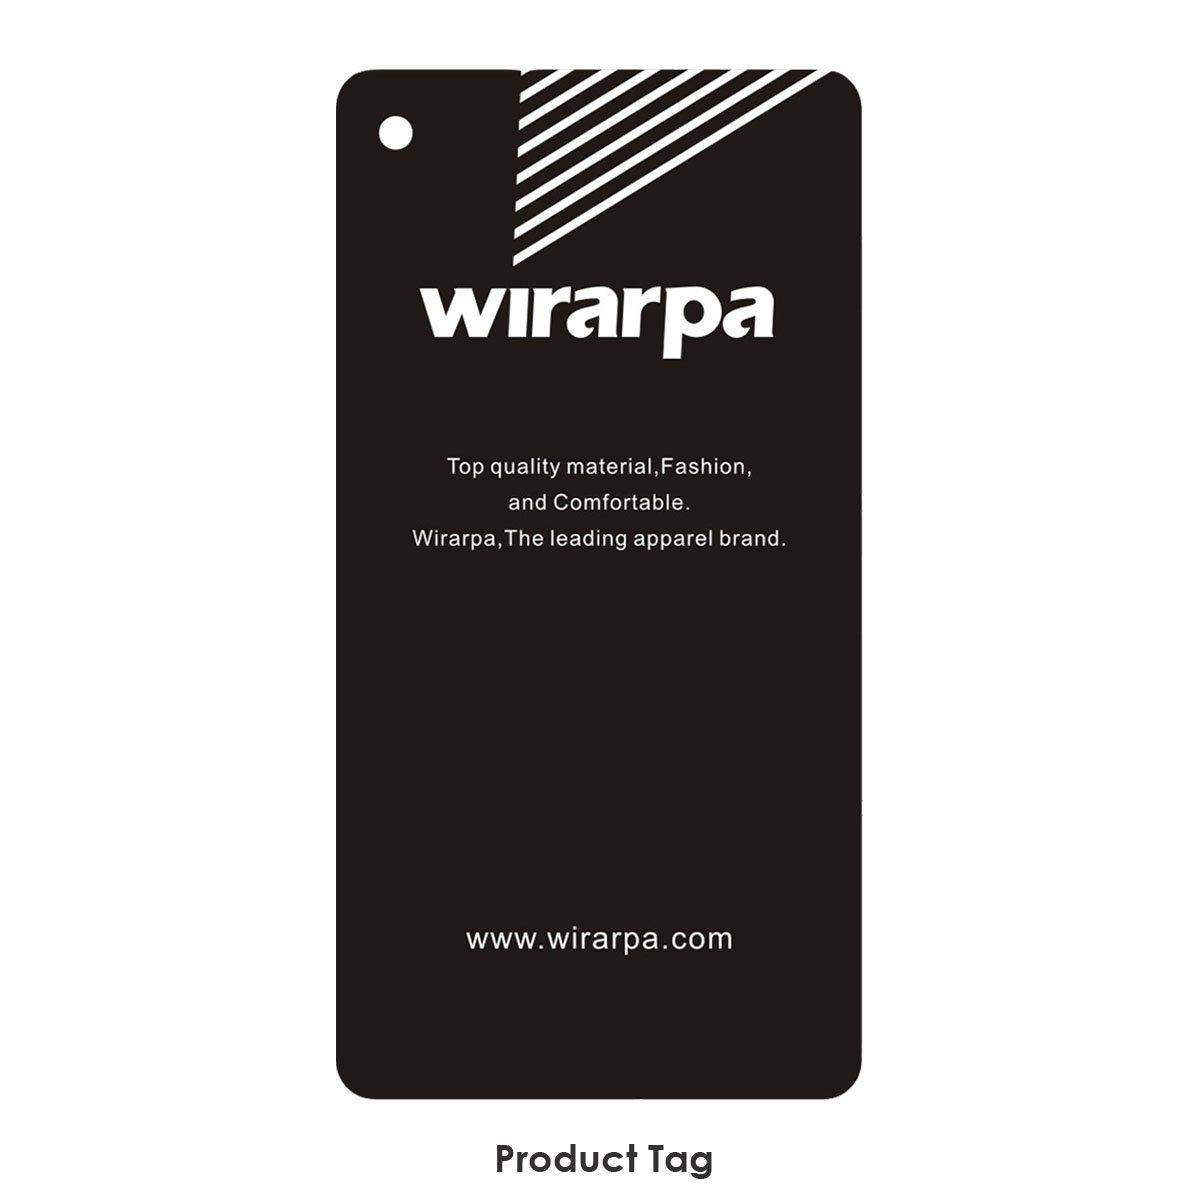 wirarpa Womens Cotton Underwear 4 Pack High Waist Briefs Light Tummy Control Ladies Comfort Stretch Panties Underpants Size XL,Multicoloured by wirarpa (Image #7)